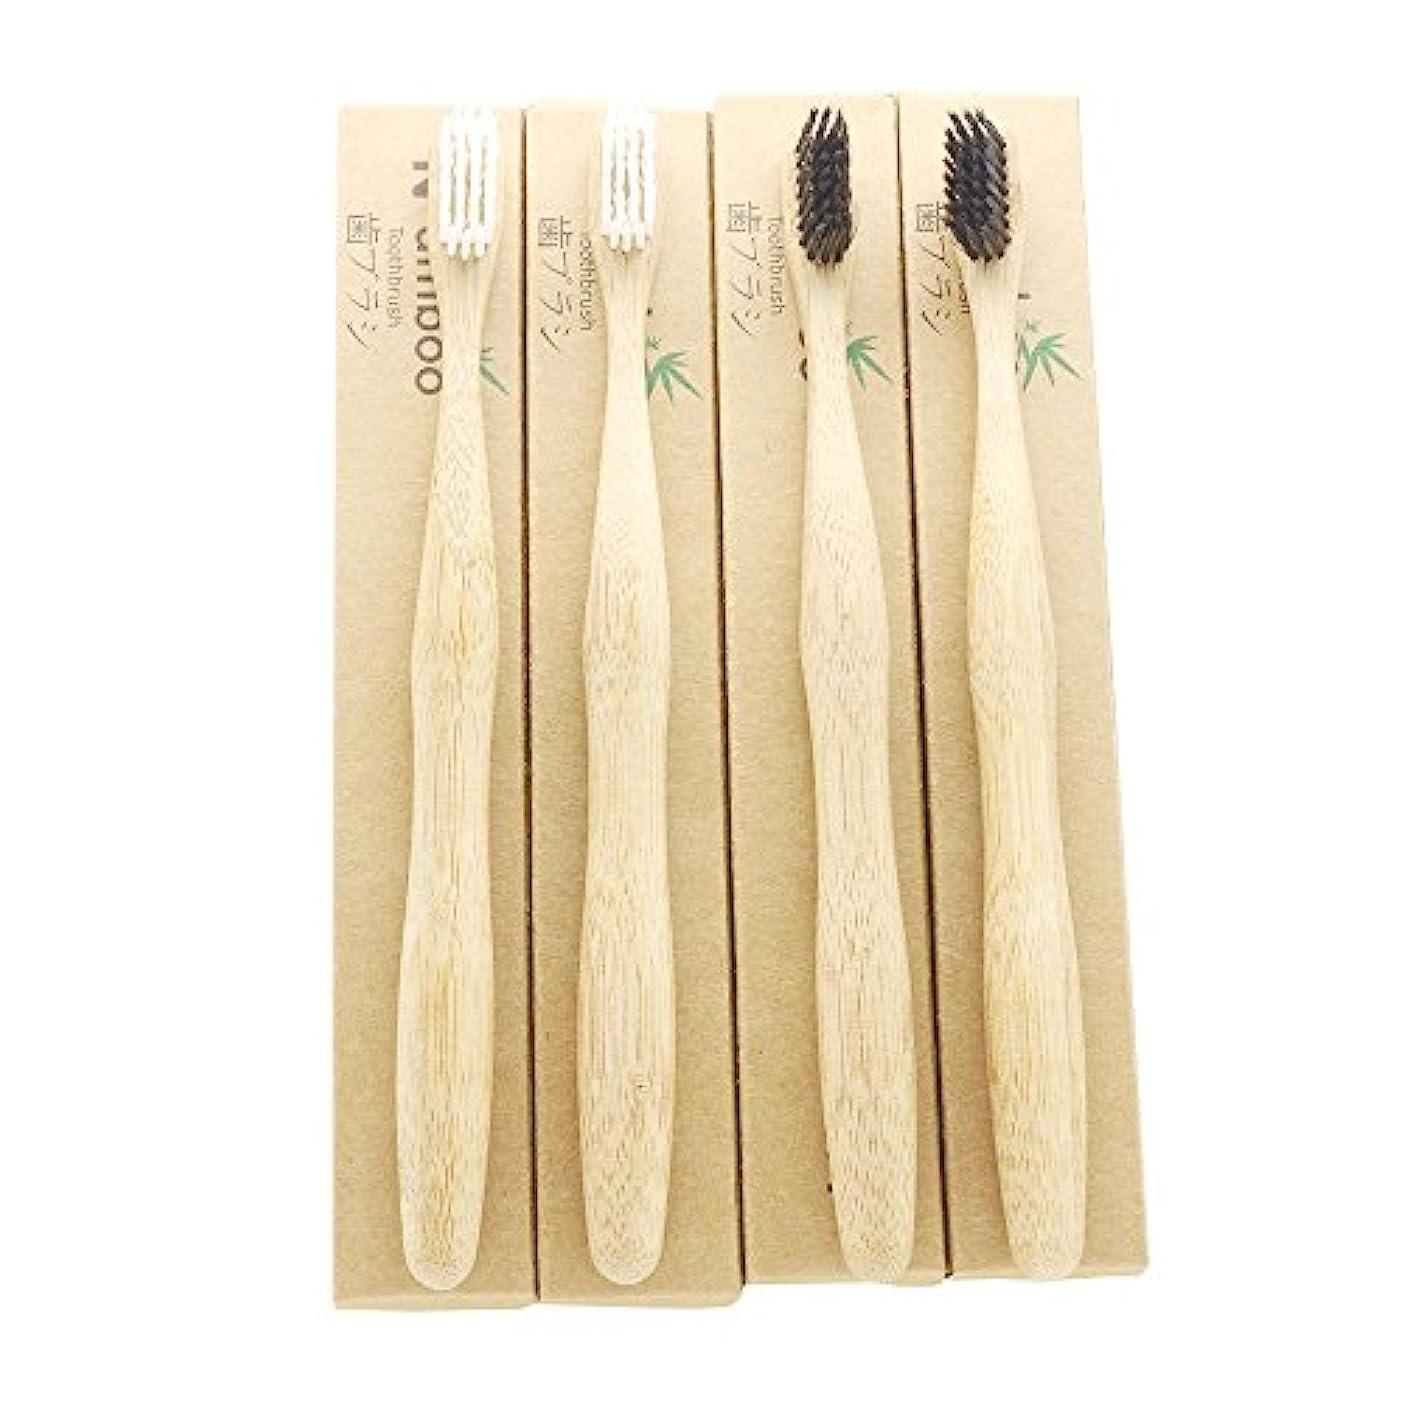 N-amboo 竹製 歯ブラシ 高耐久性 白と黒 セット エコ (4本)